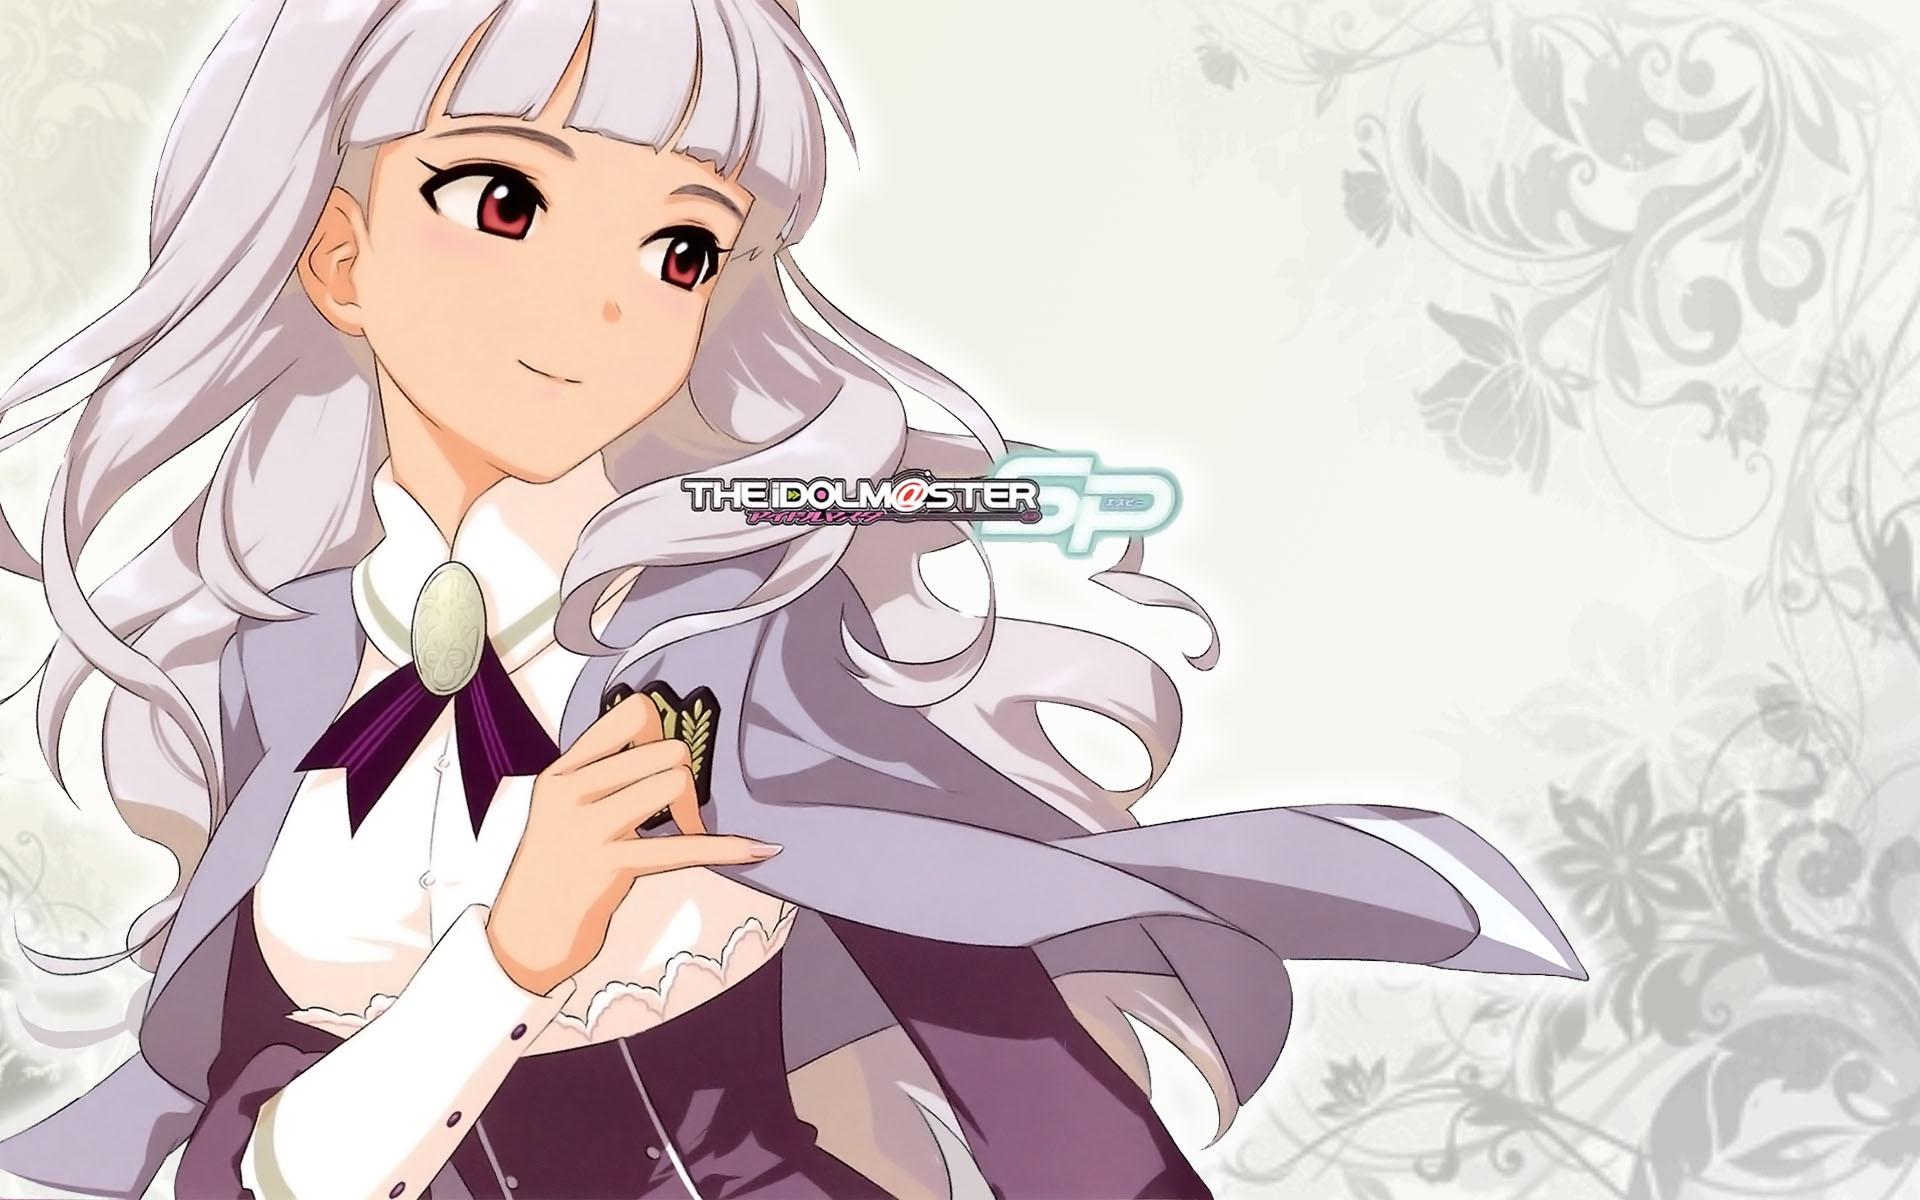 Wallpaper Drawing Illustration Anime Cartoon Cute